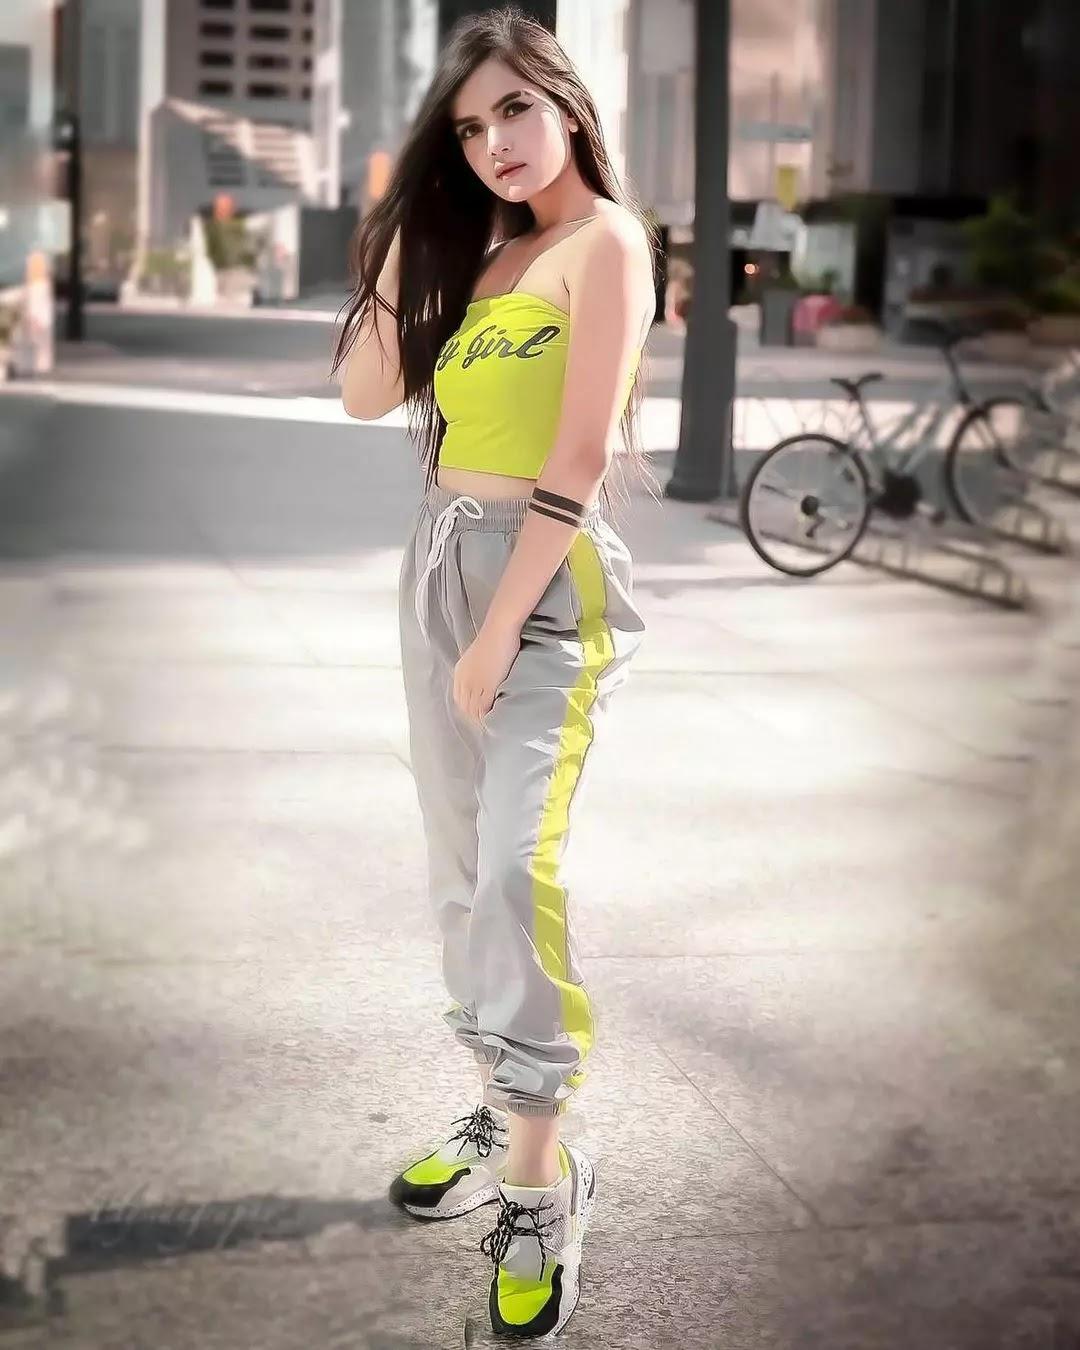 hot neha jethwani photo